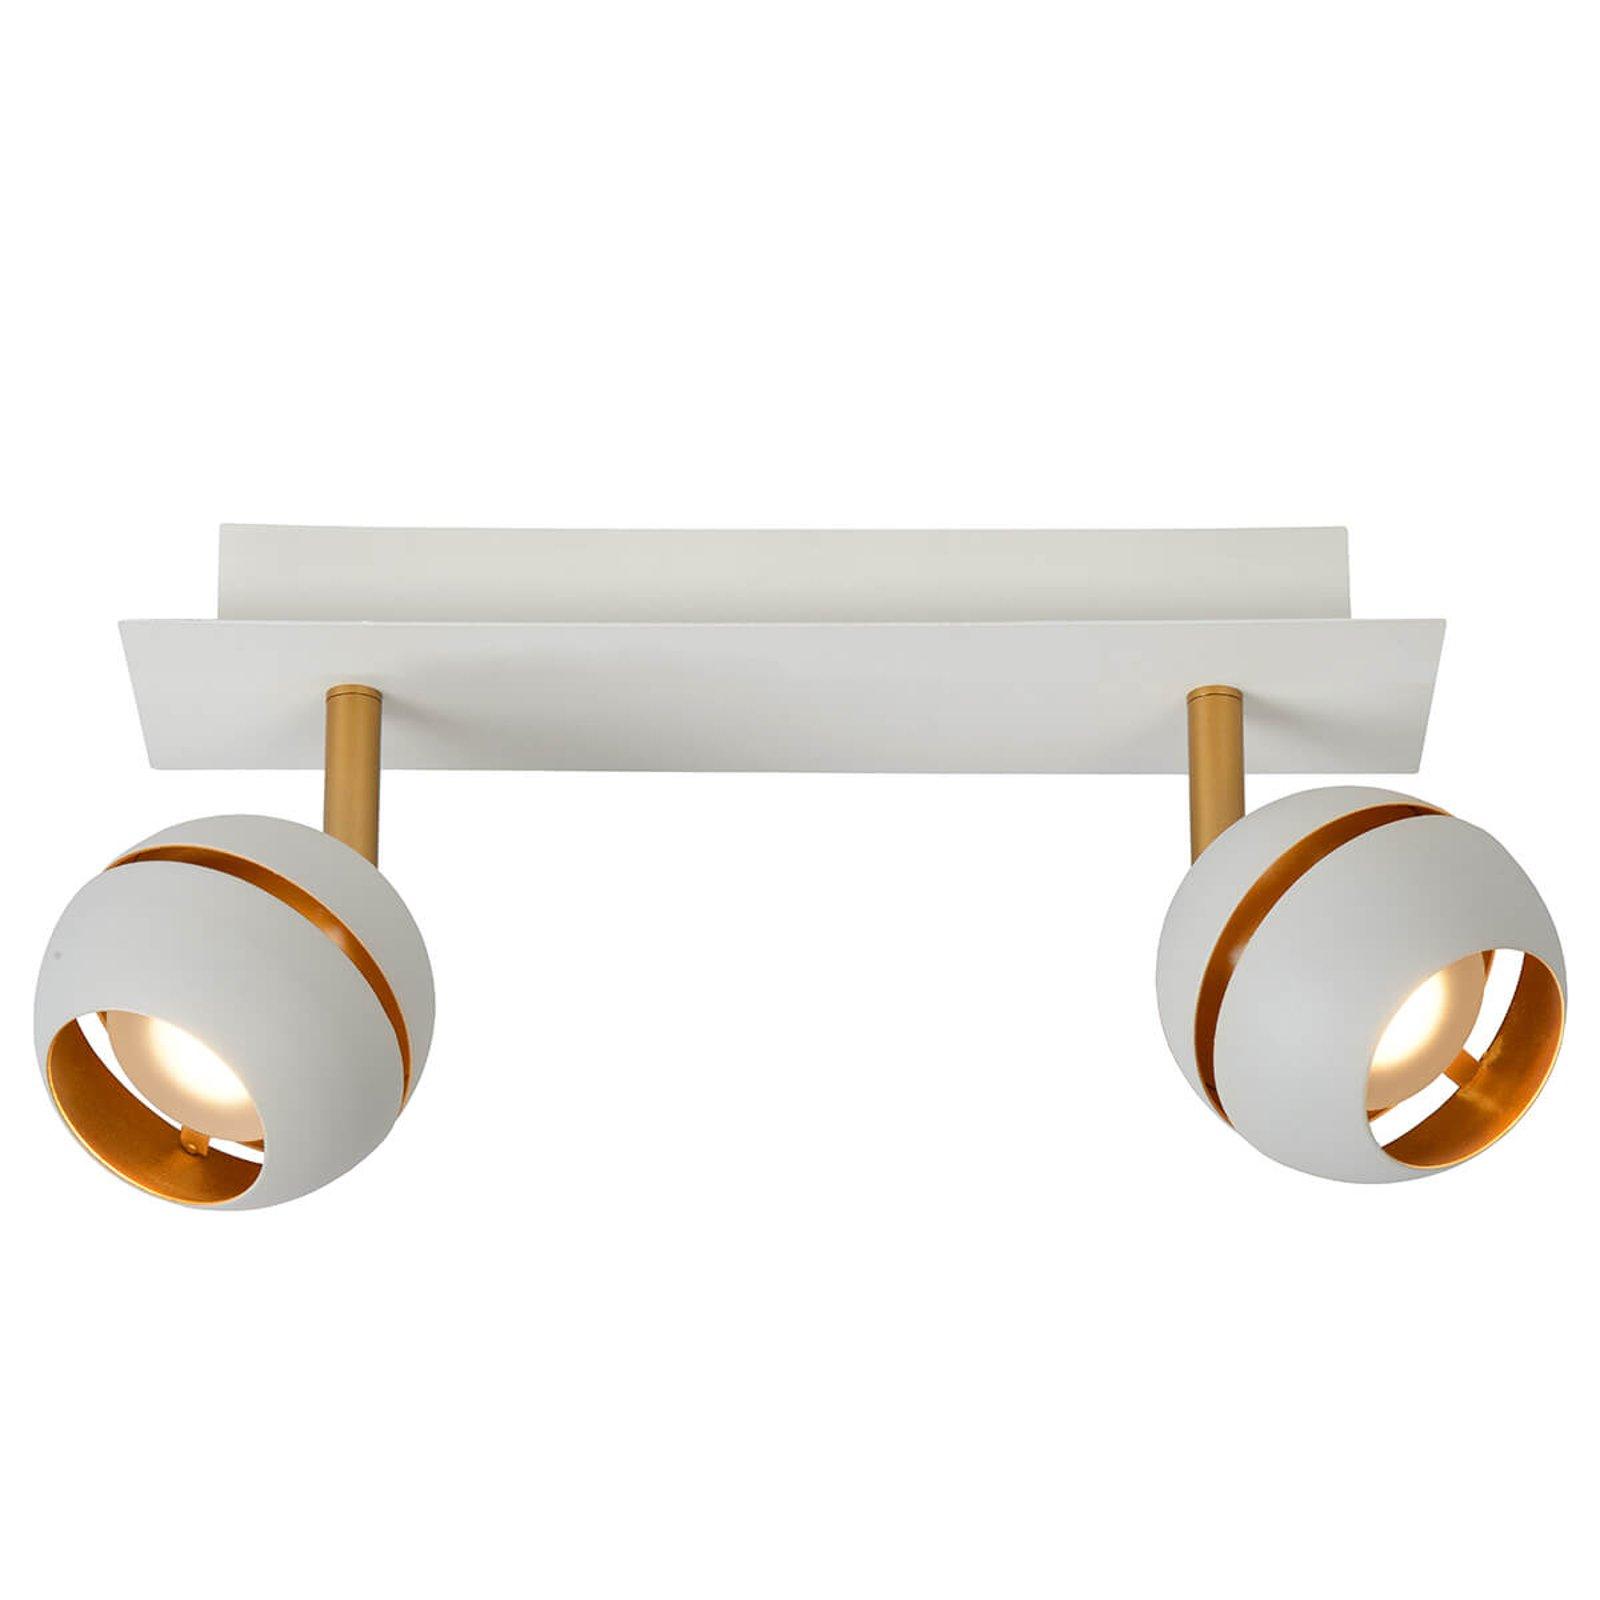 Binari LED-taklampe, 2 lyskilder, hvit